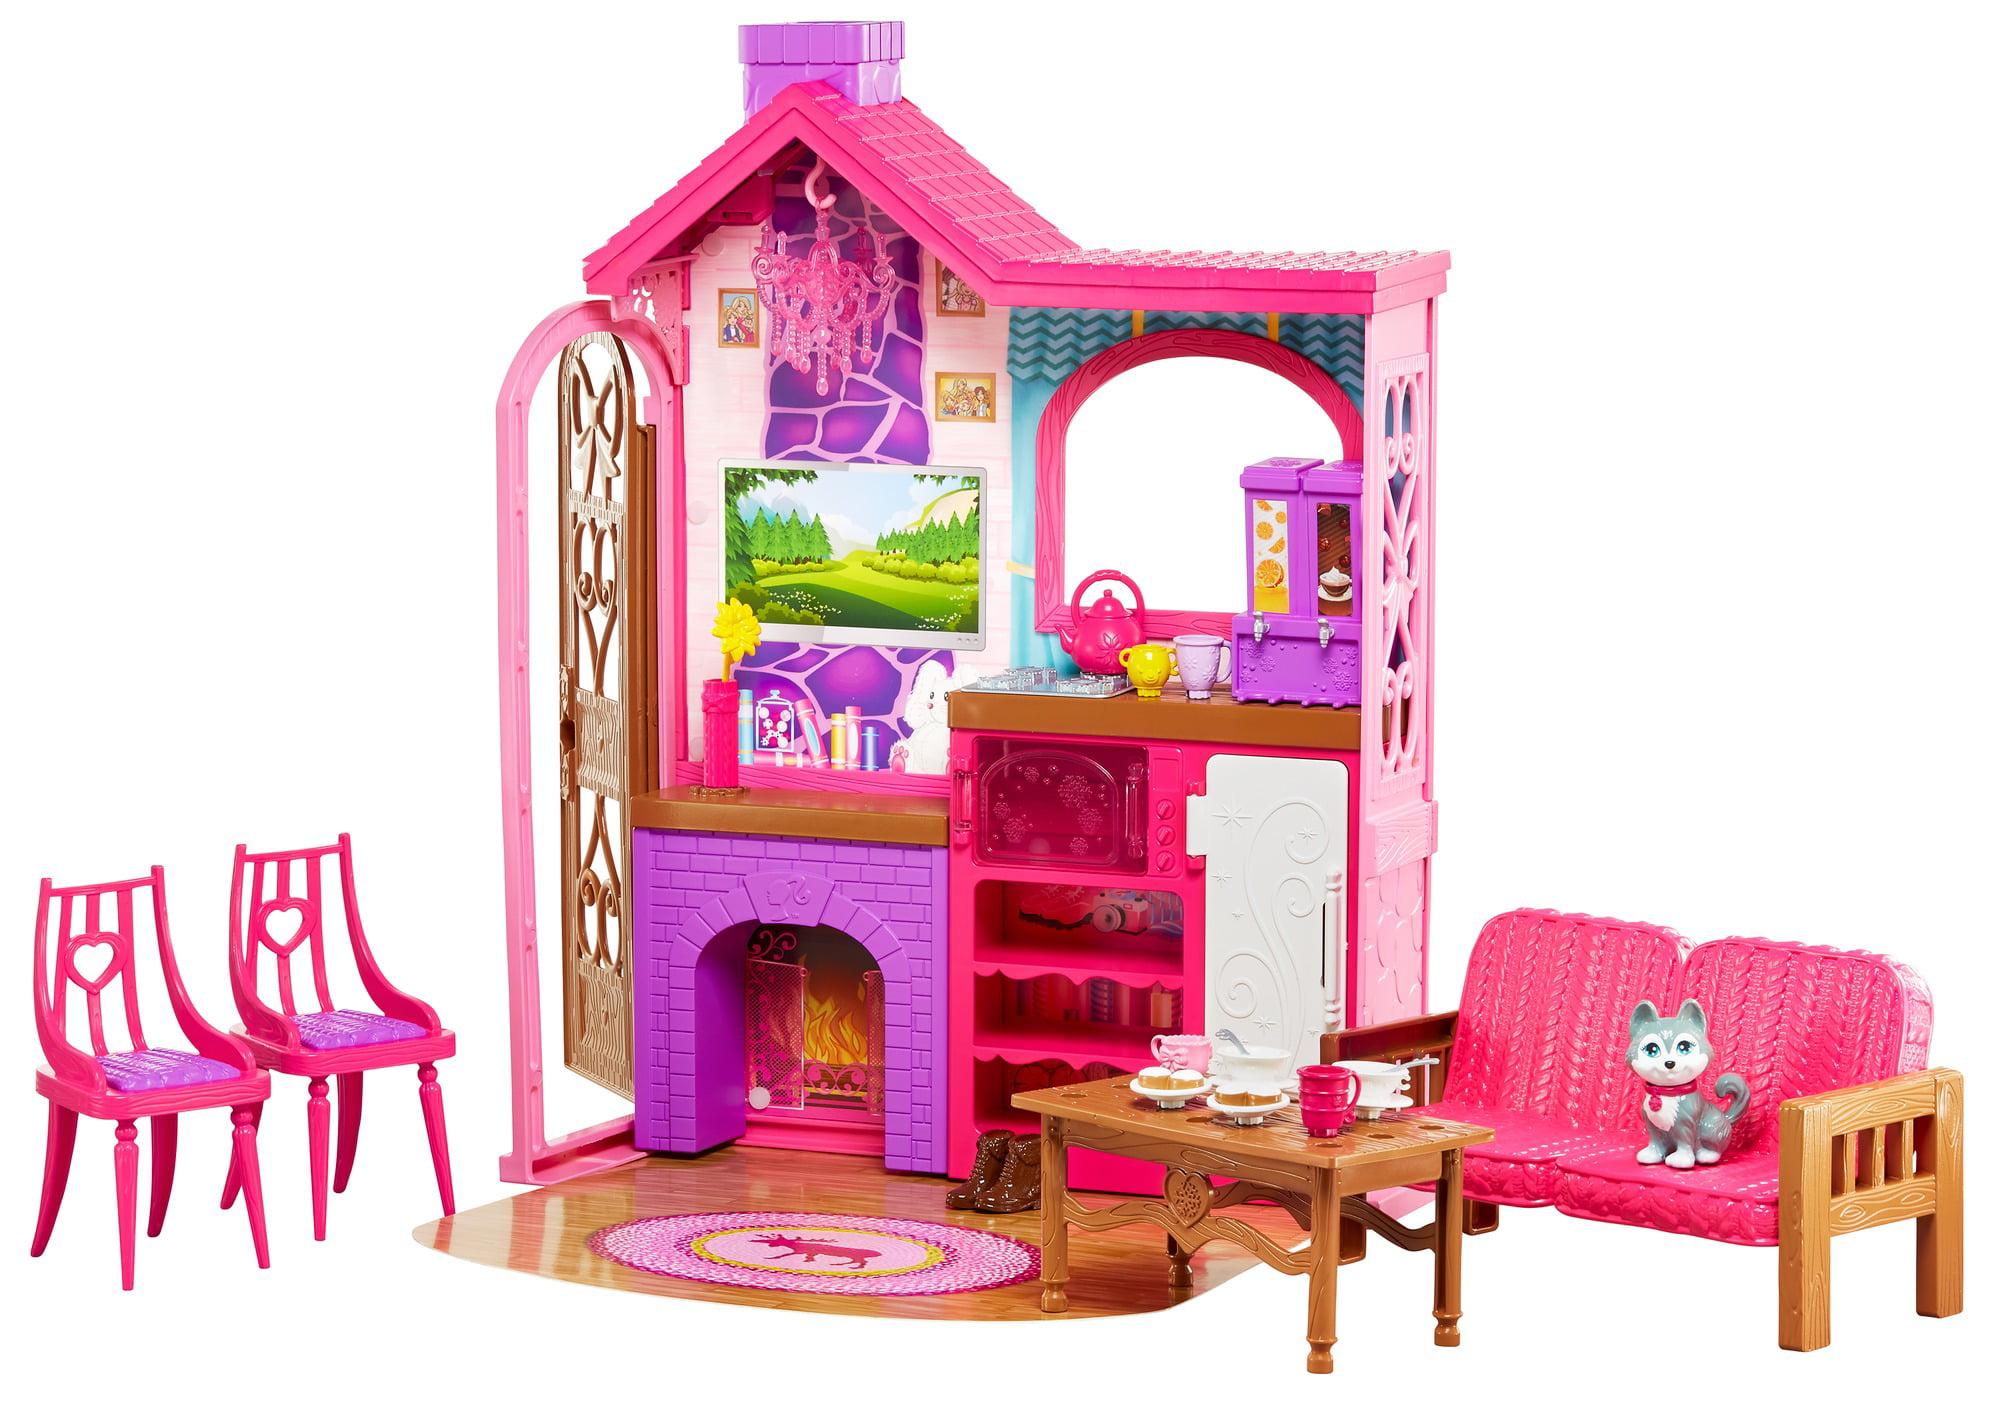 Barbie Camping Fun Cabin Playset by MATTEL INC.